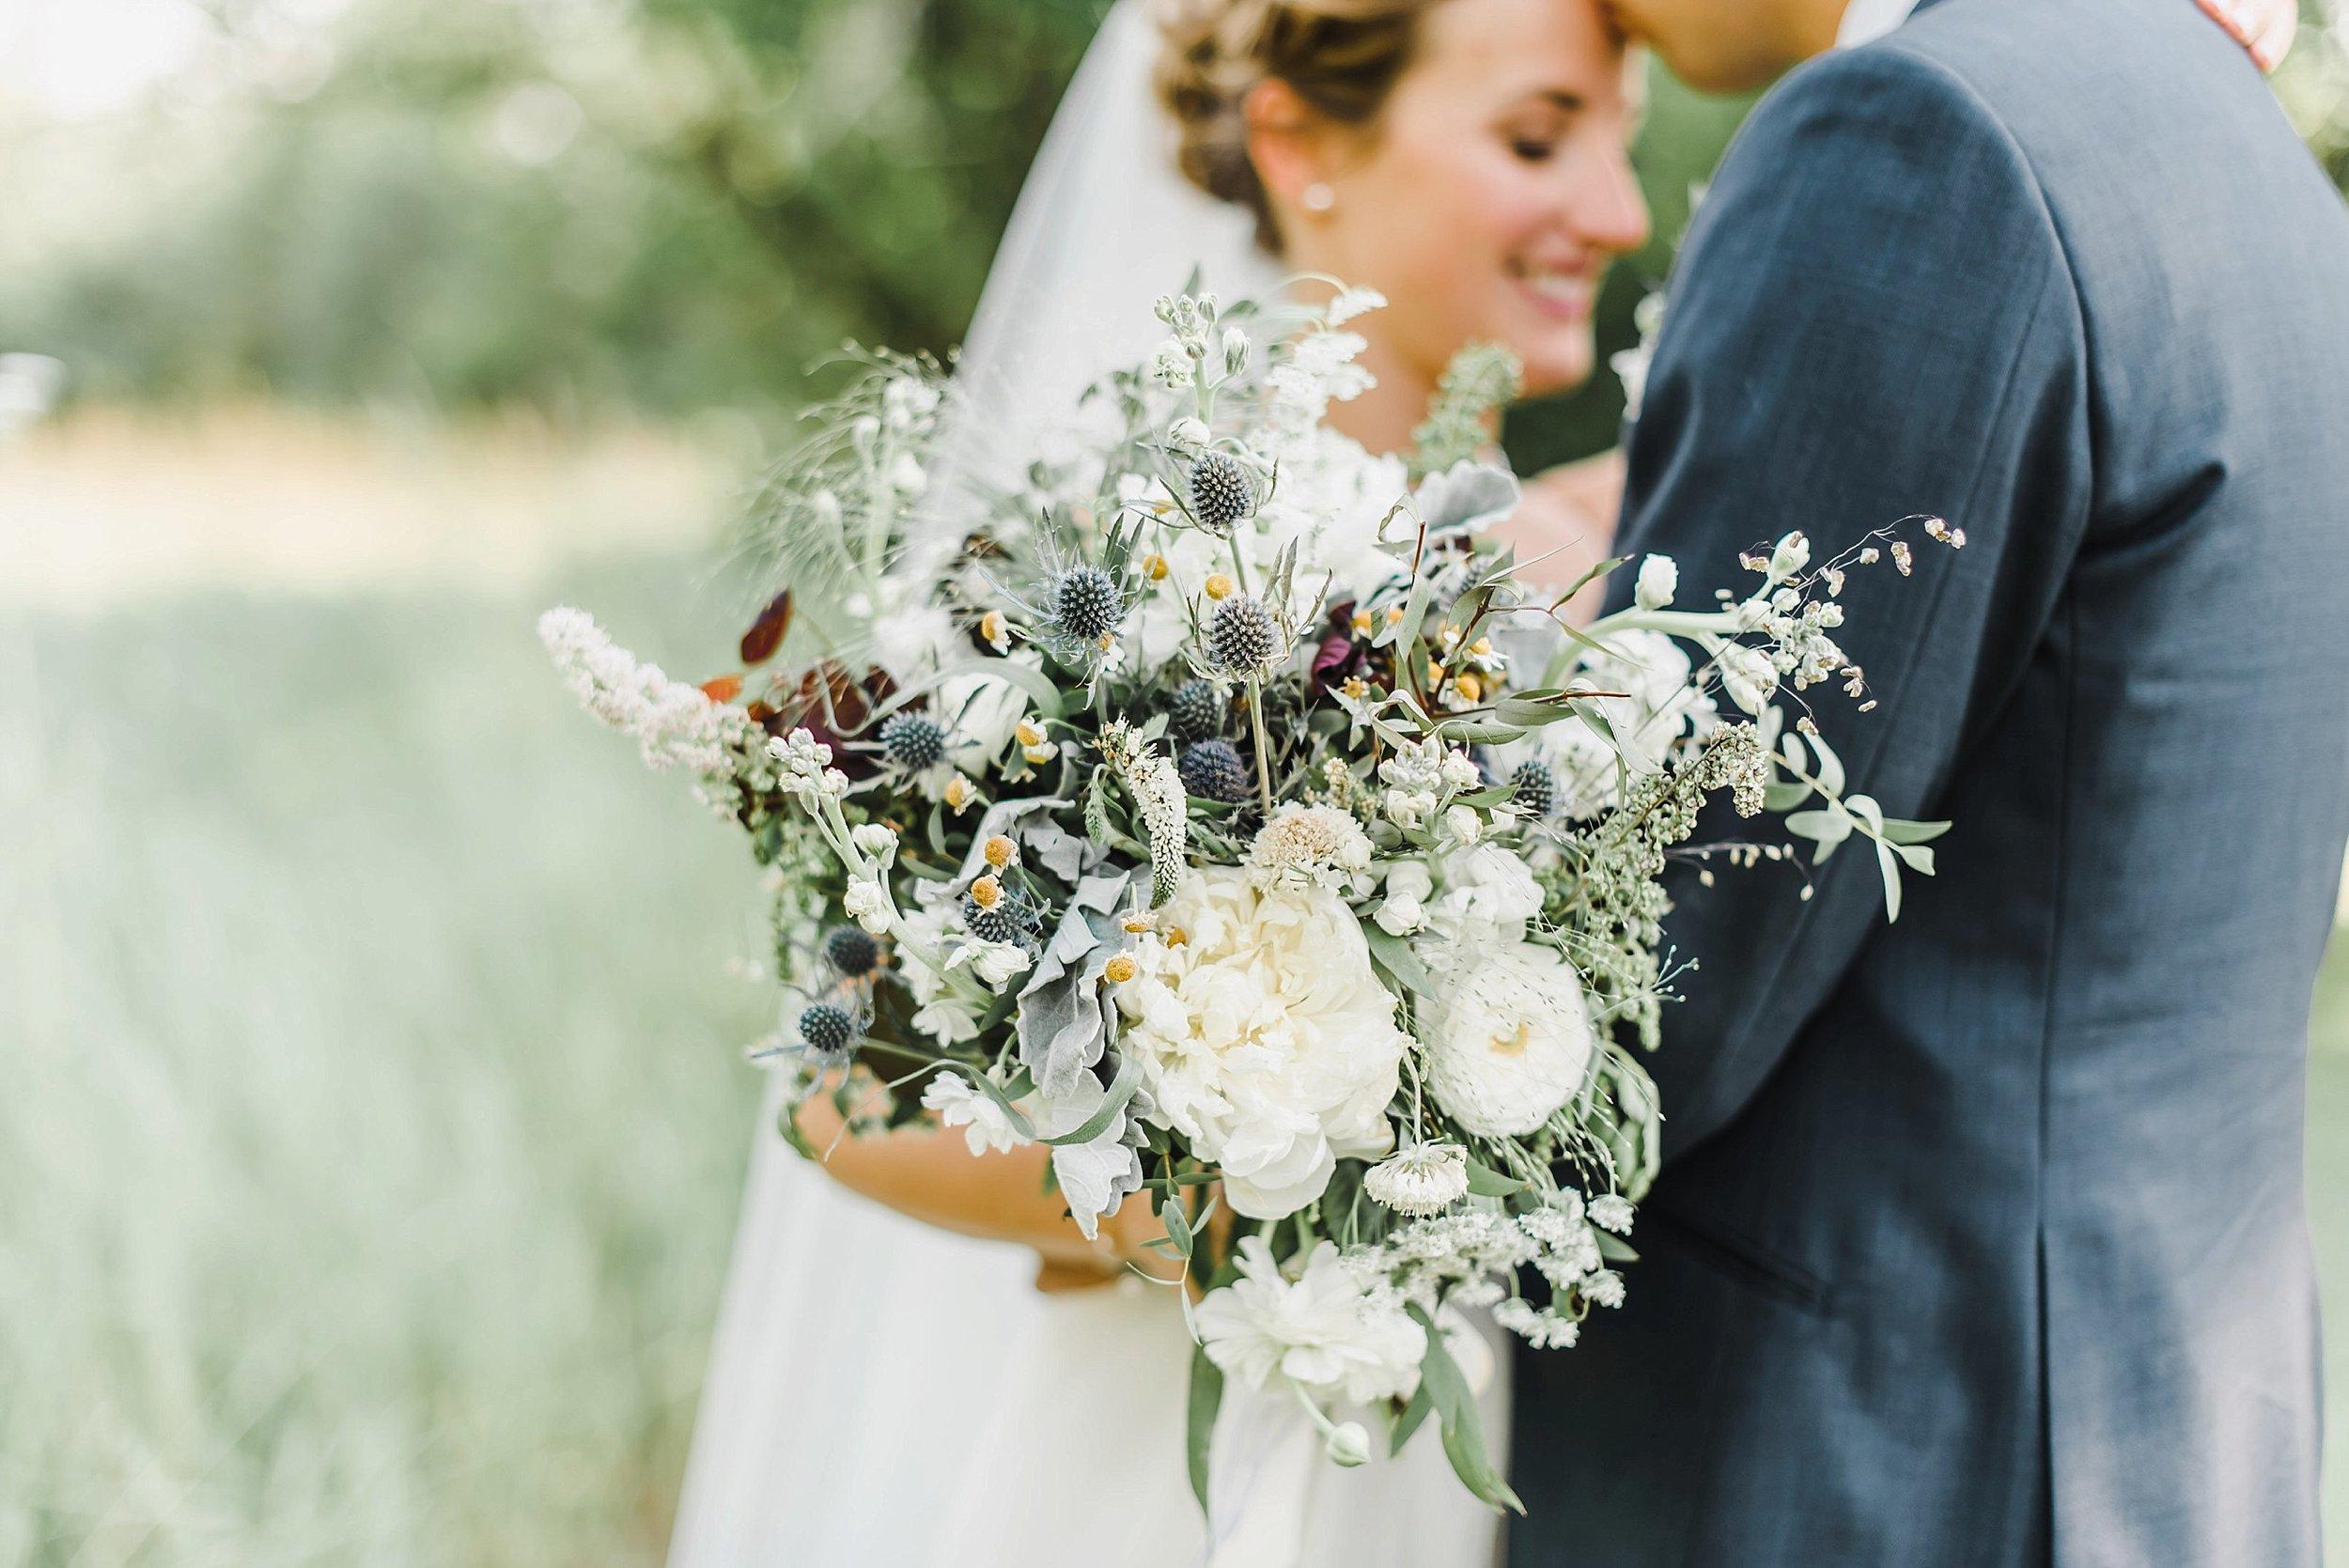 light airy indie fine art ottawa wedding photographer | Ali and Batoul Photography_0835.jpg